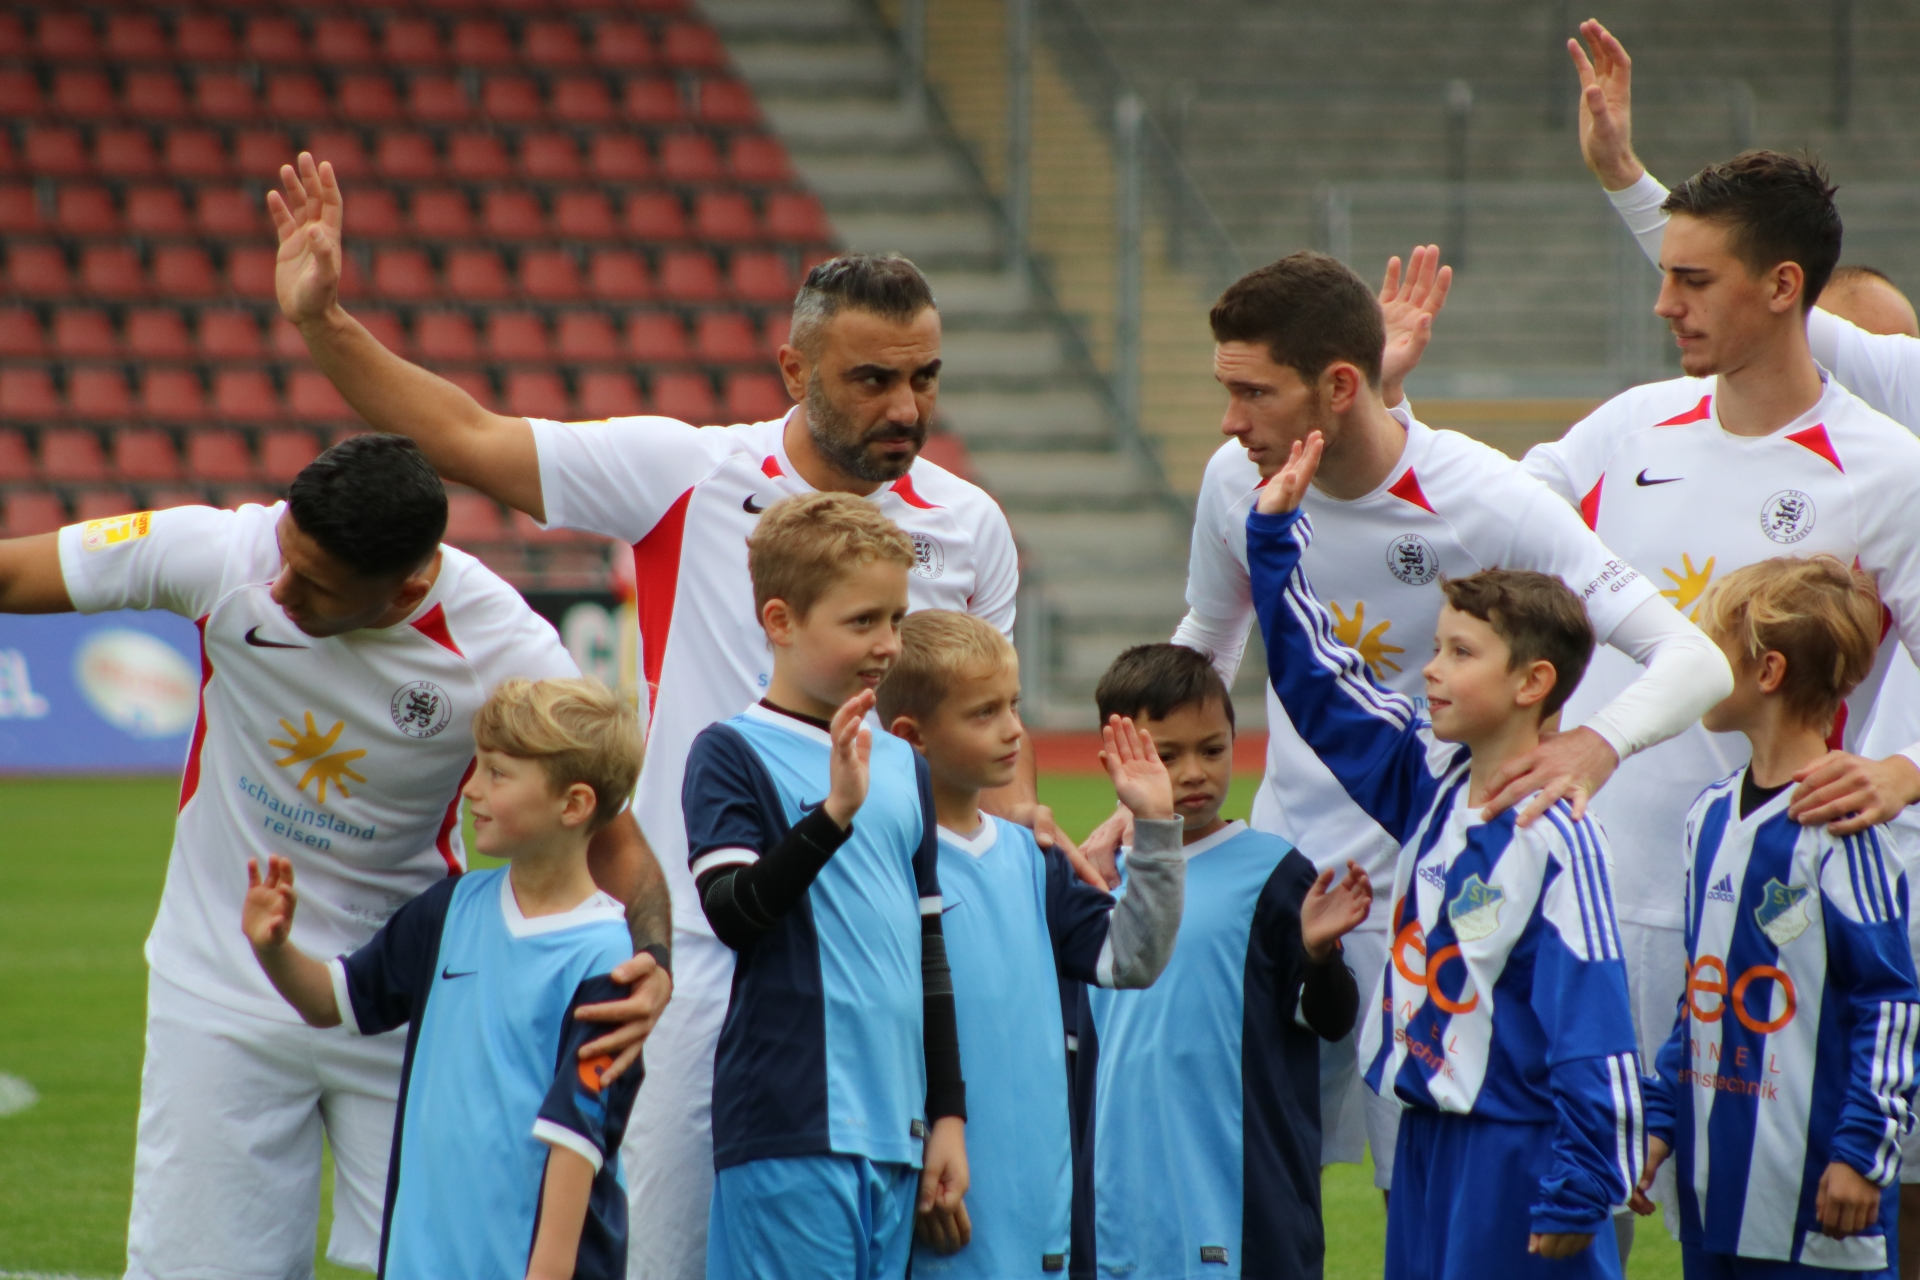 KSV Hessen Kassel - FC Eddersheim